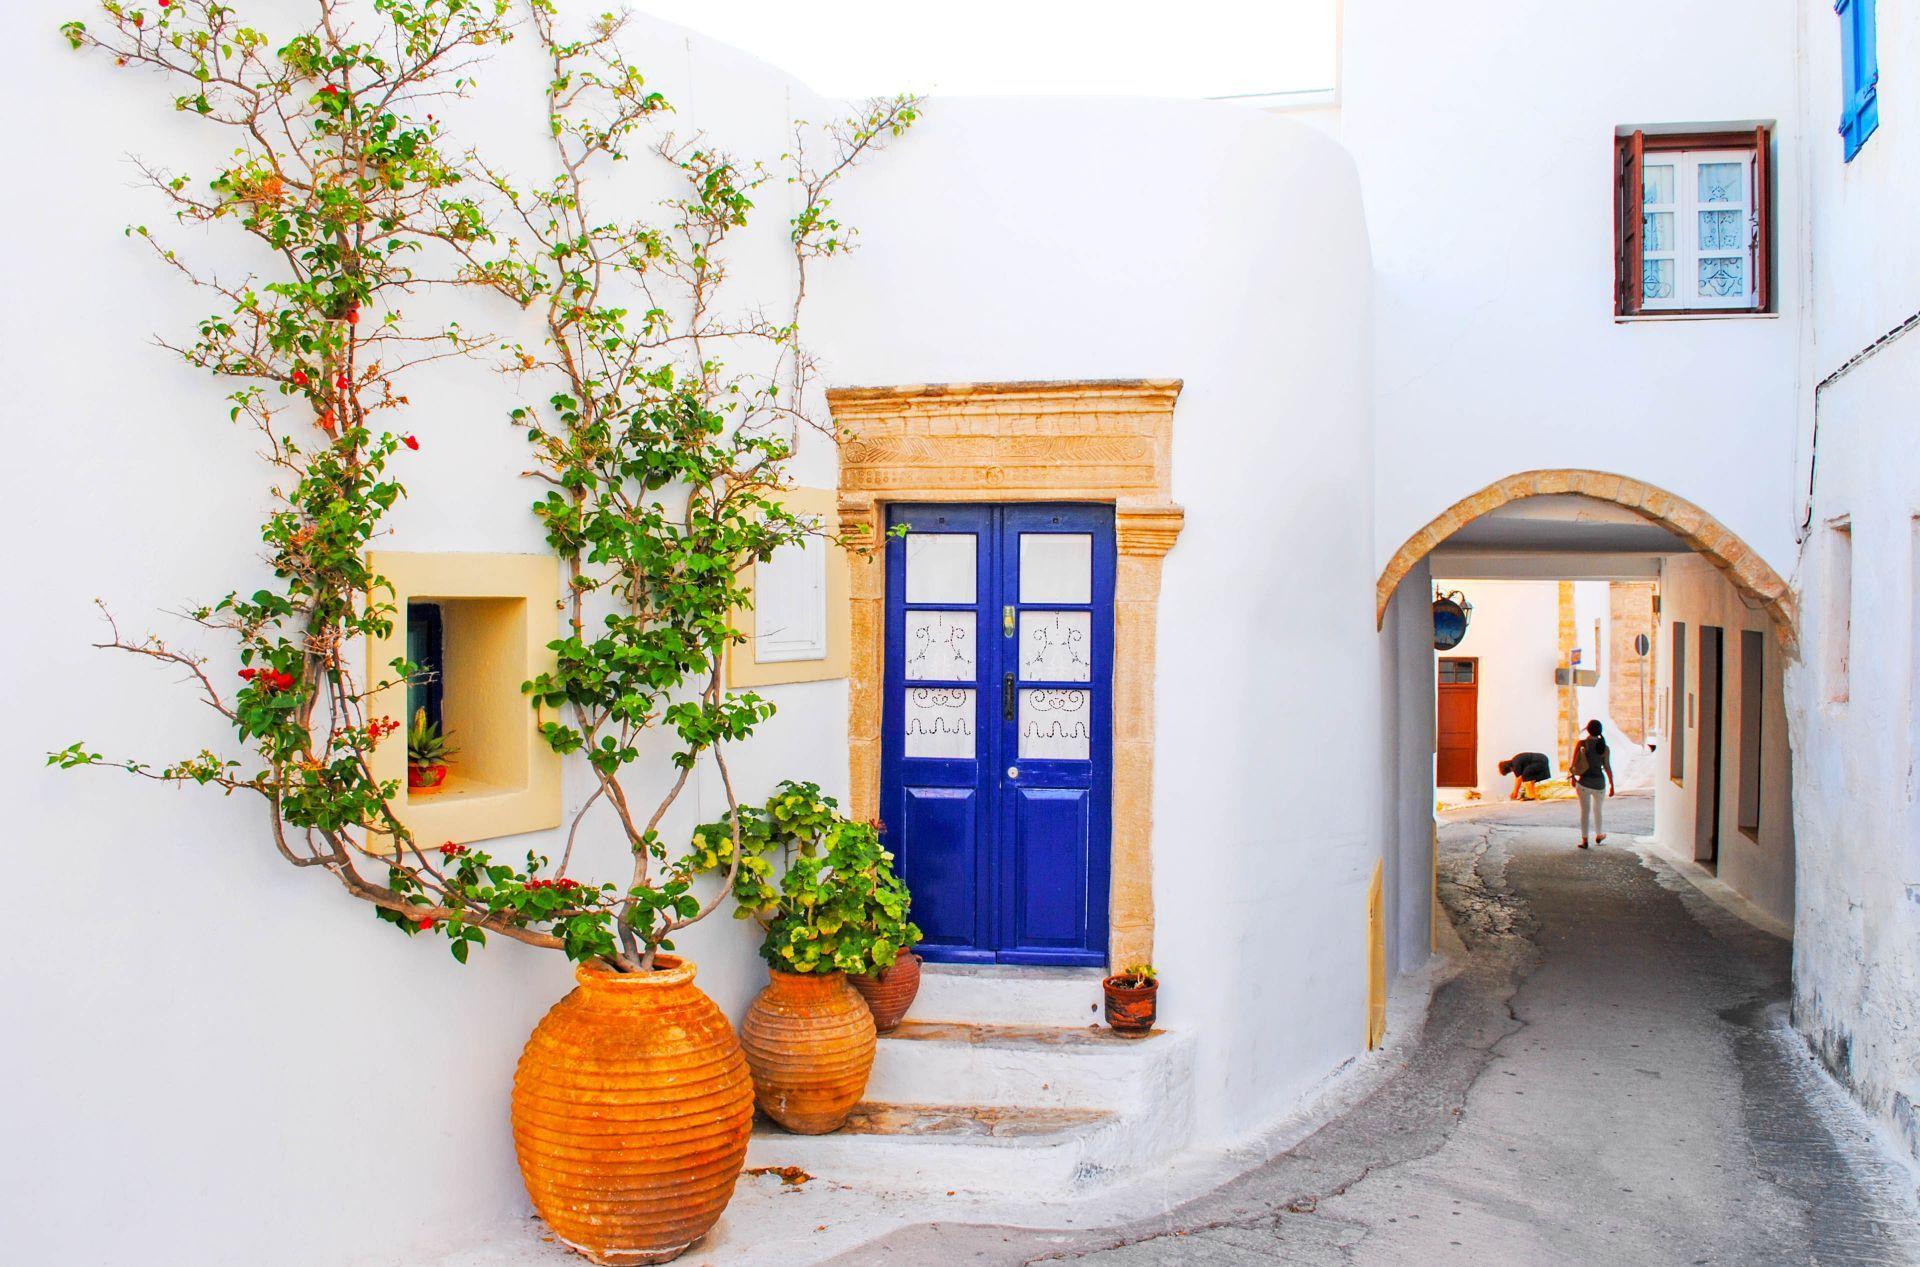 Ionian islands: Chora, the main village of Kythira Island